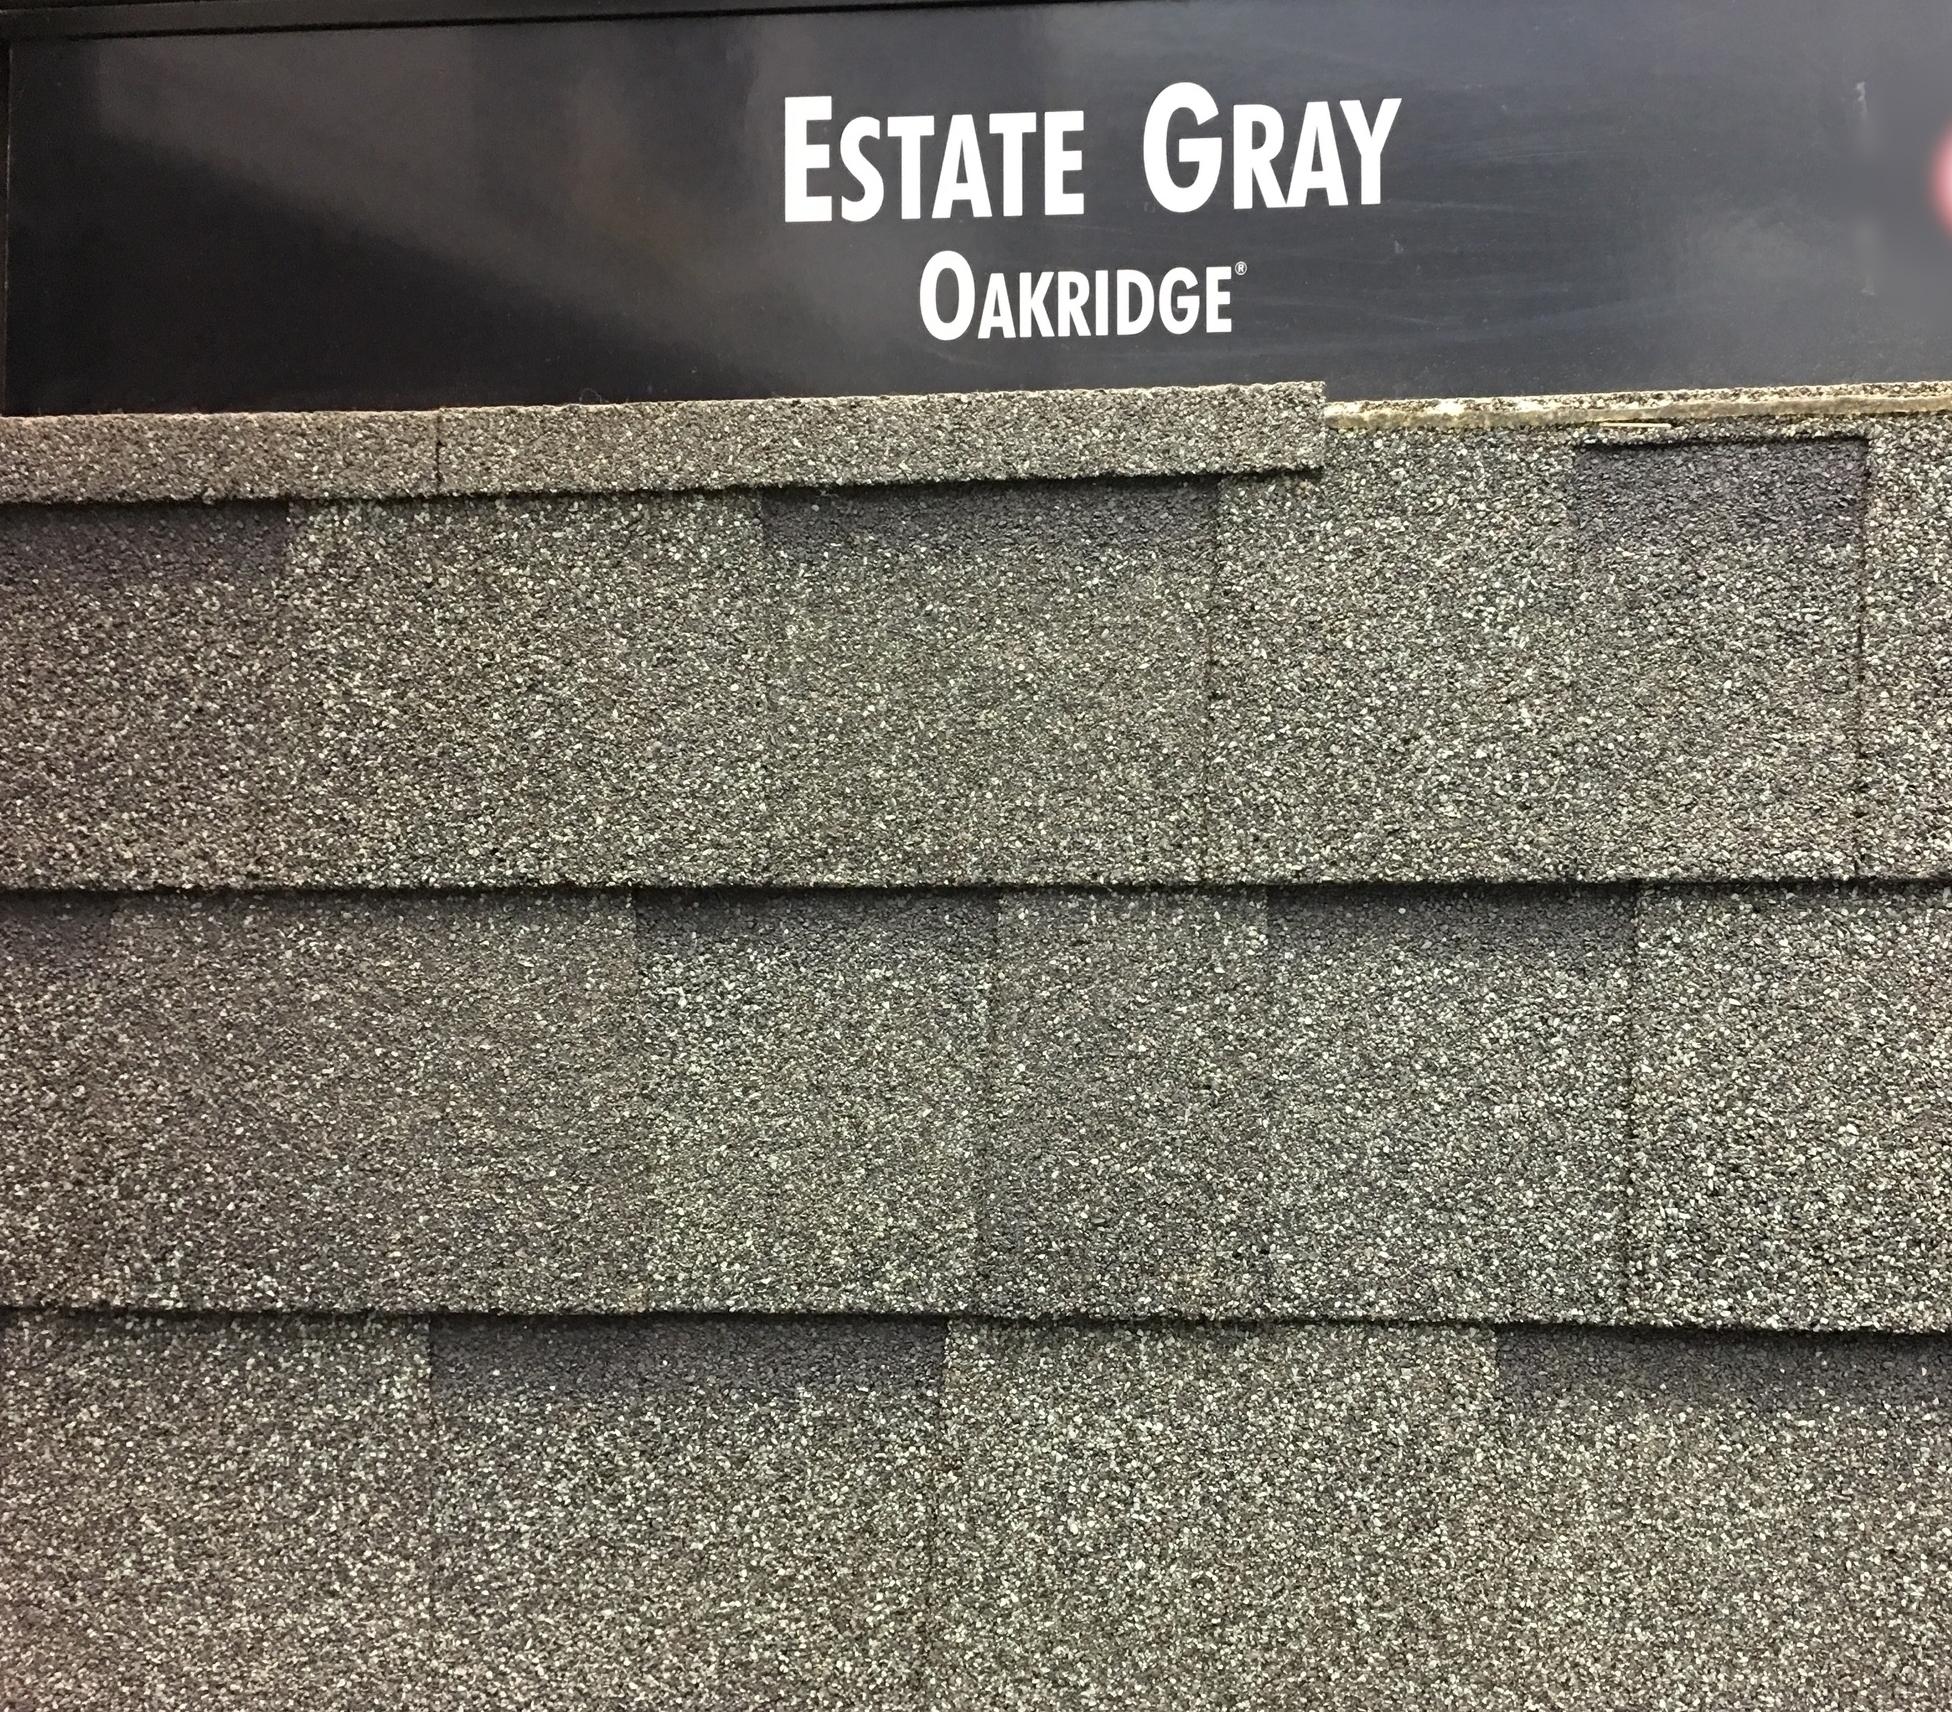 Estate Gray Shingles